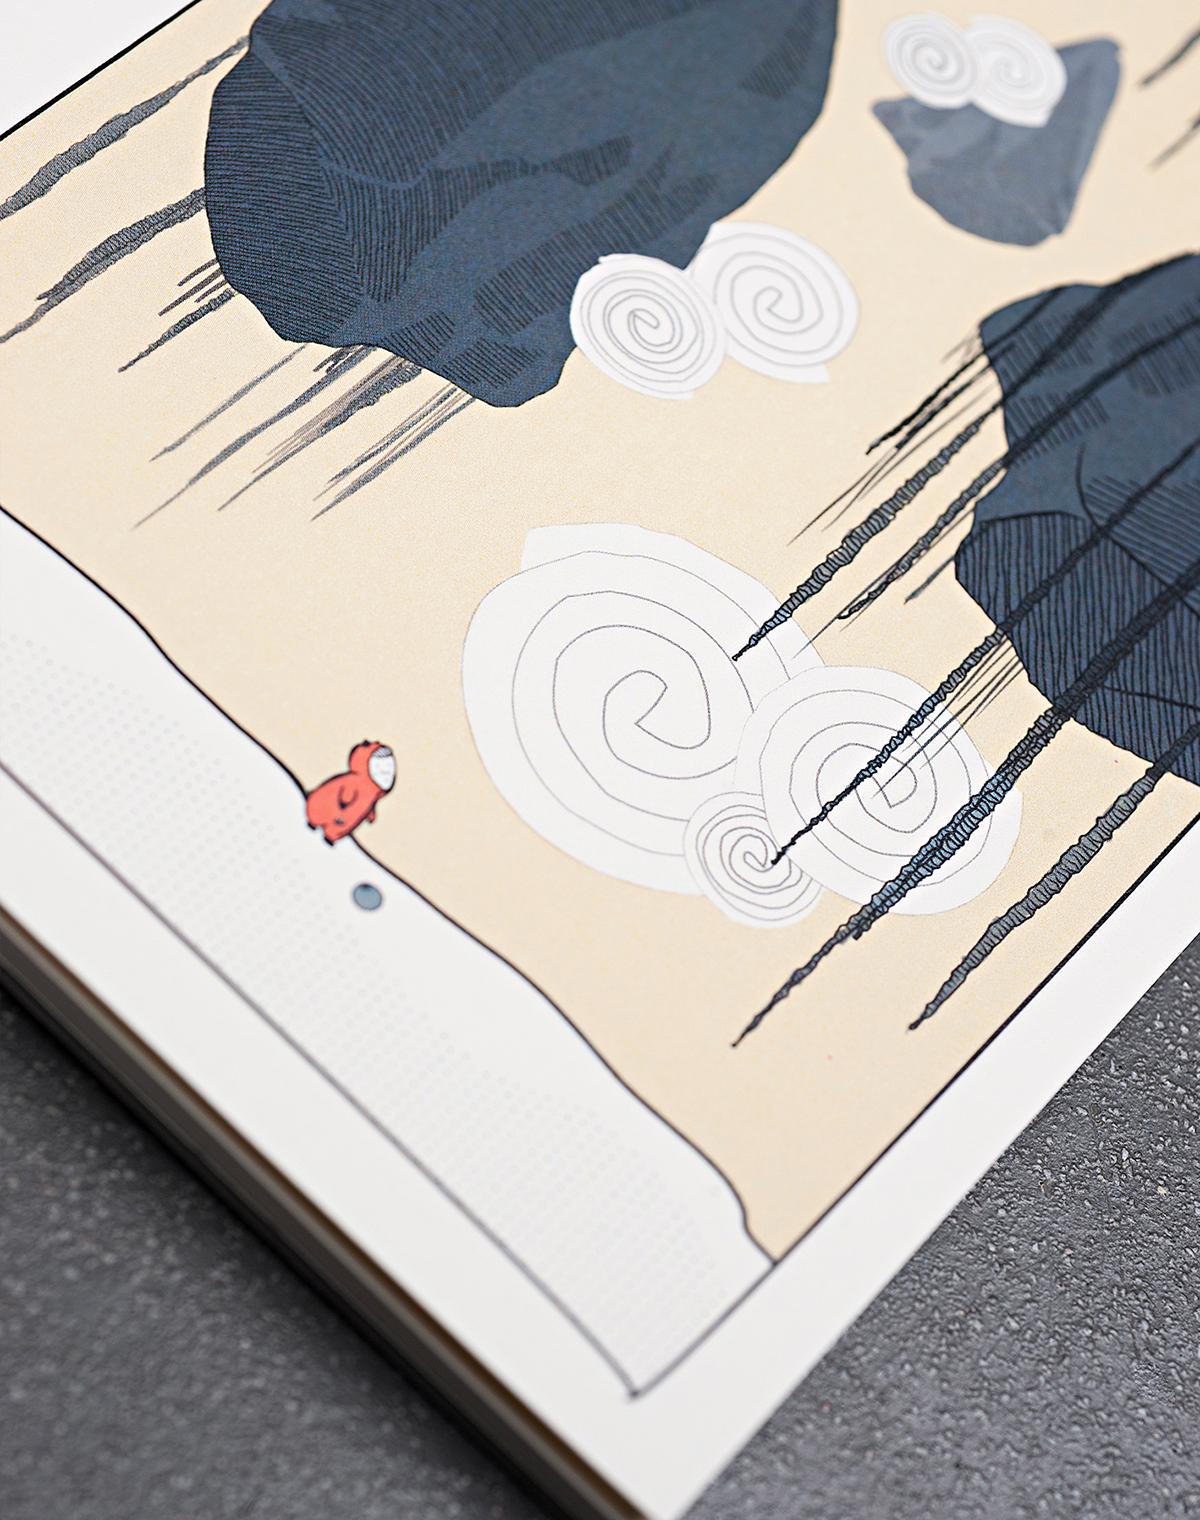 kinderbuch Hoch buch htwg konstanz